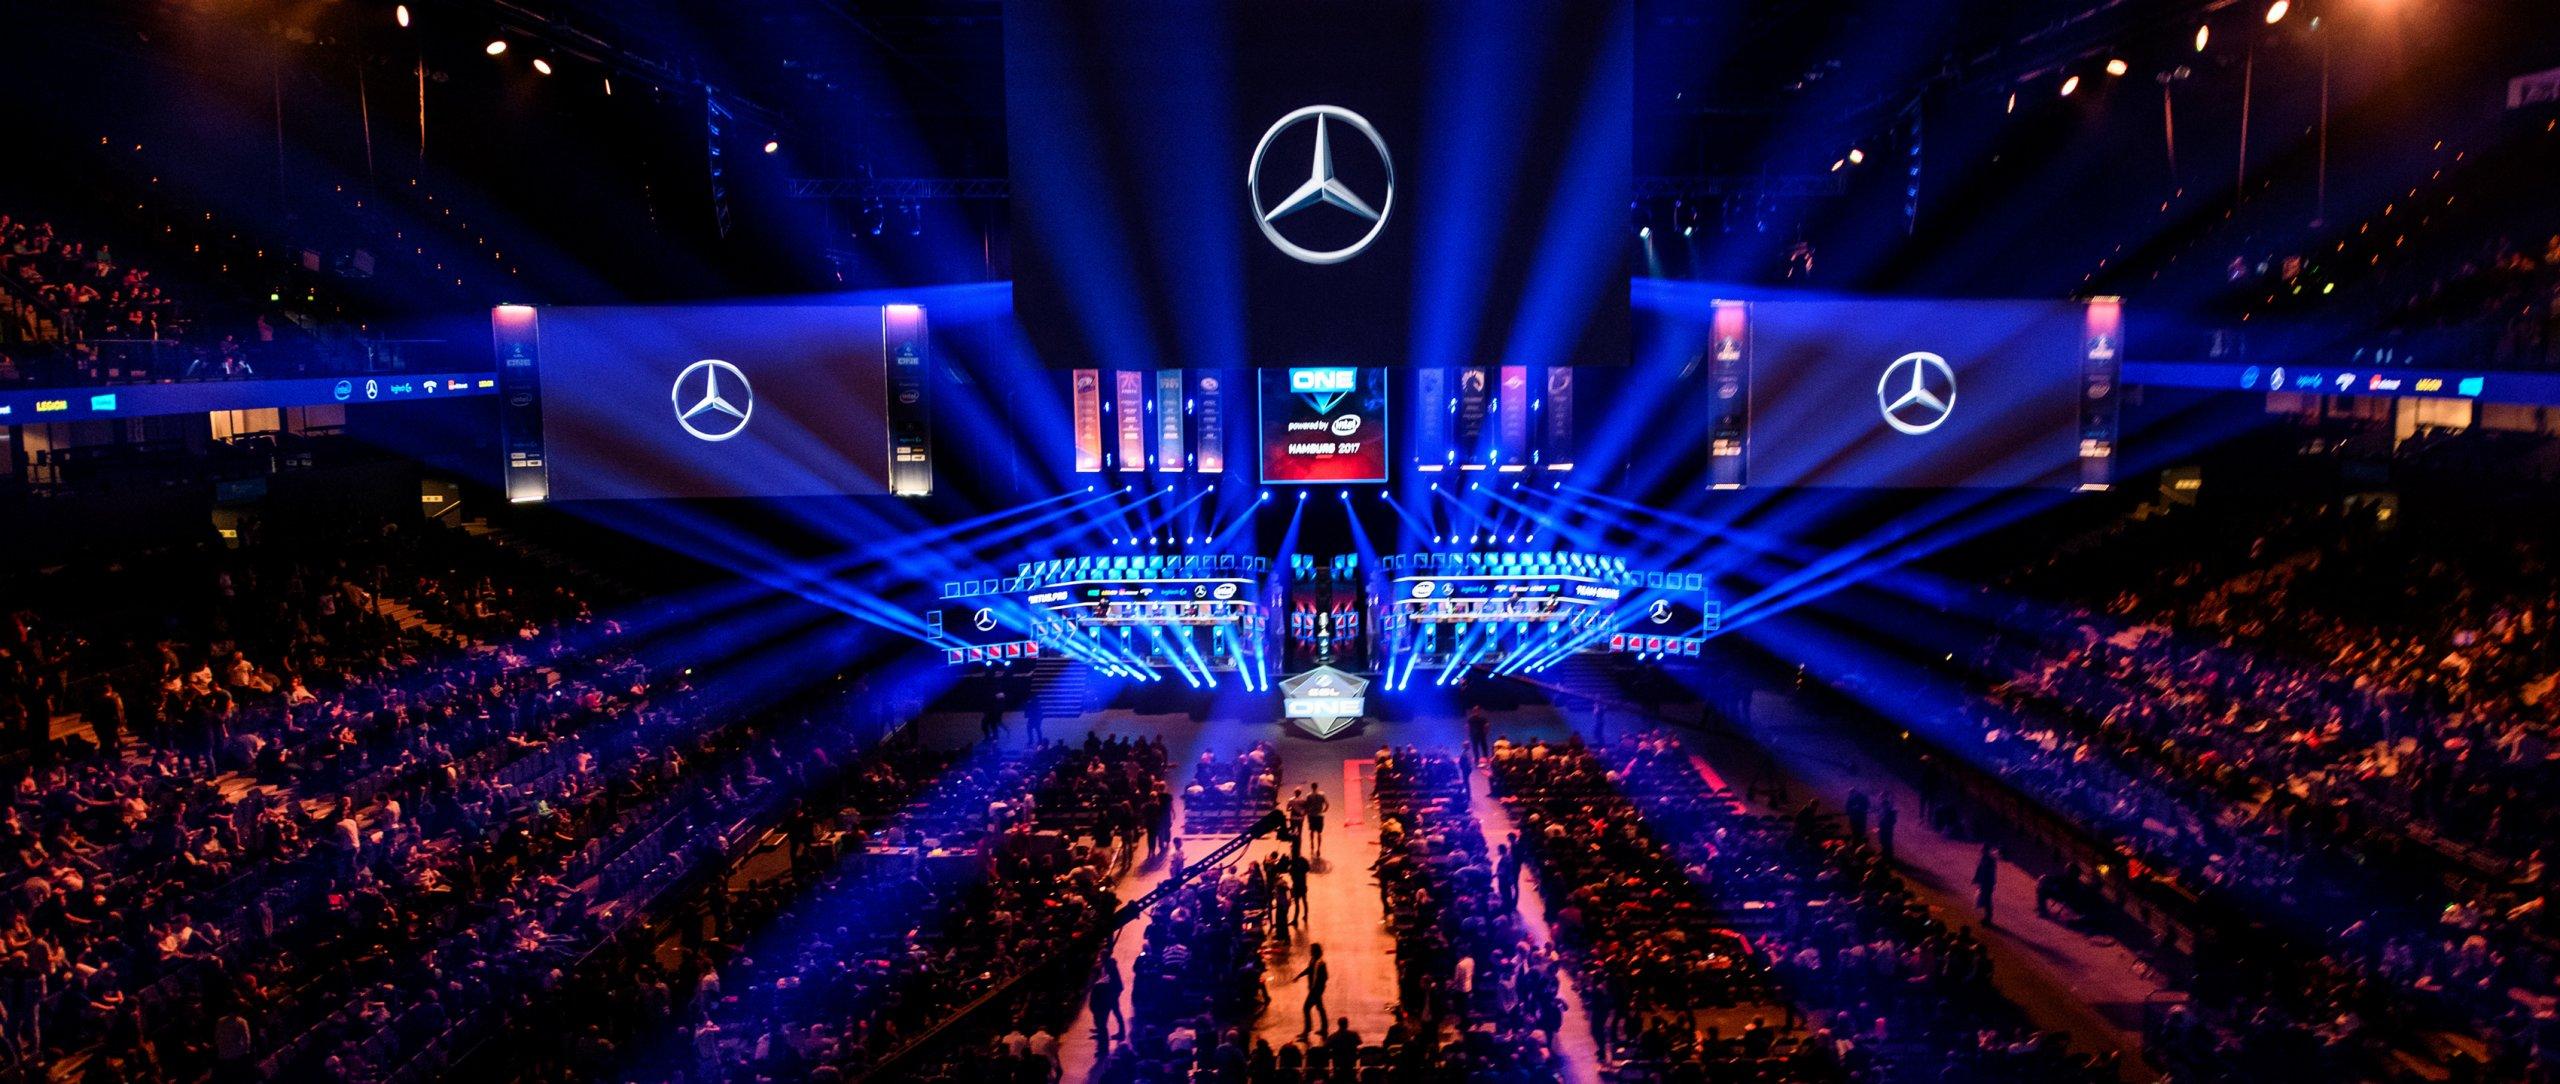 Merecedes Benz now 'Global Partner' of League of Legends Esports